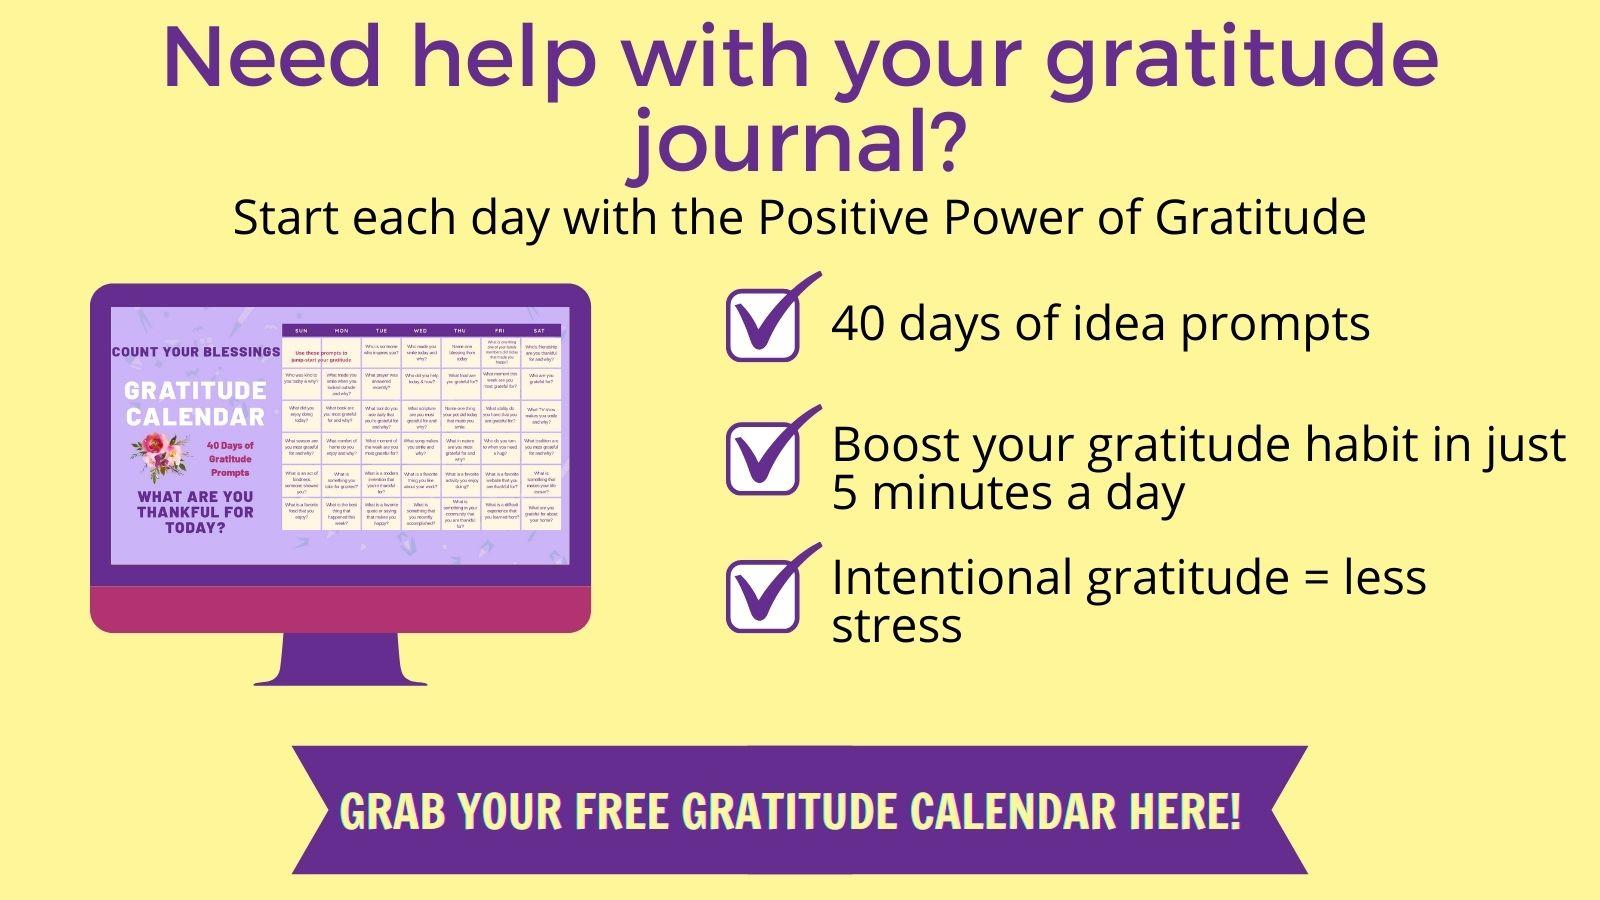 Grab your calendar here